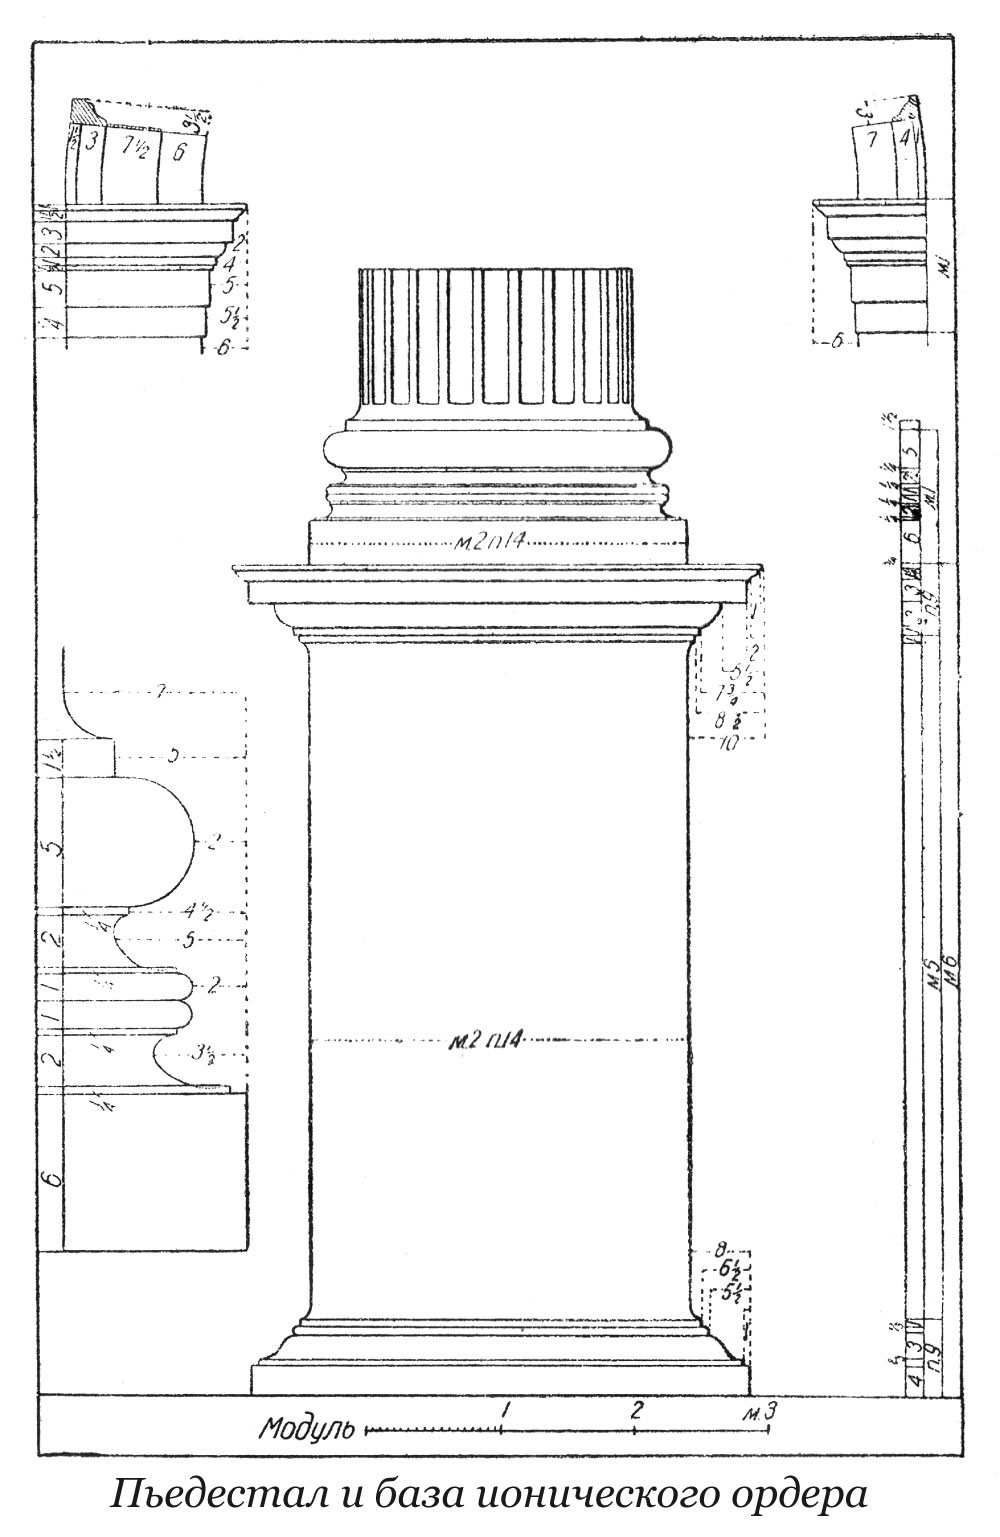 ionic_pedestal-base